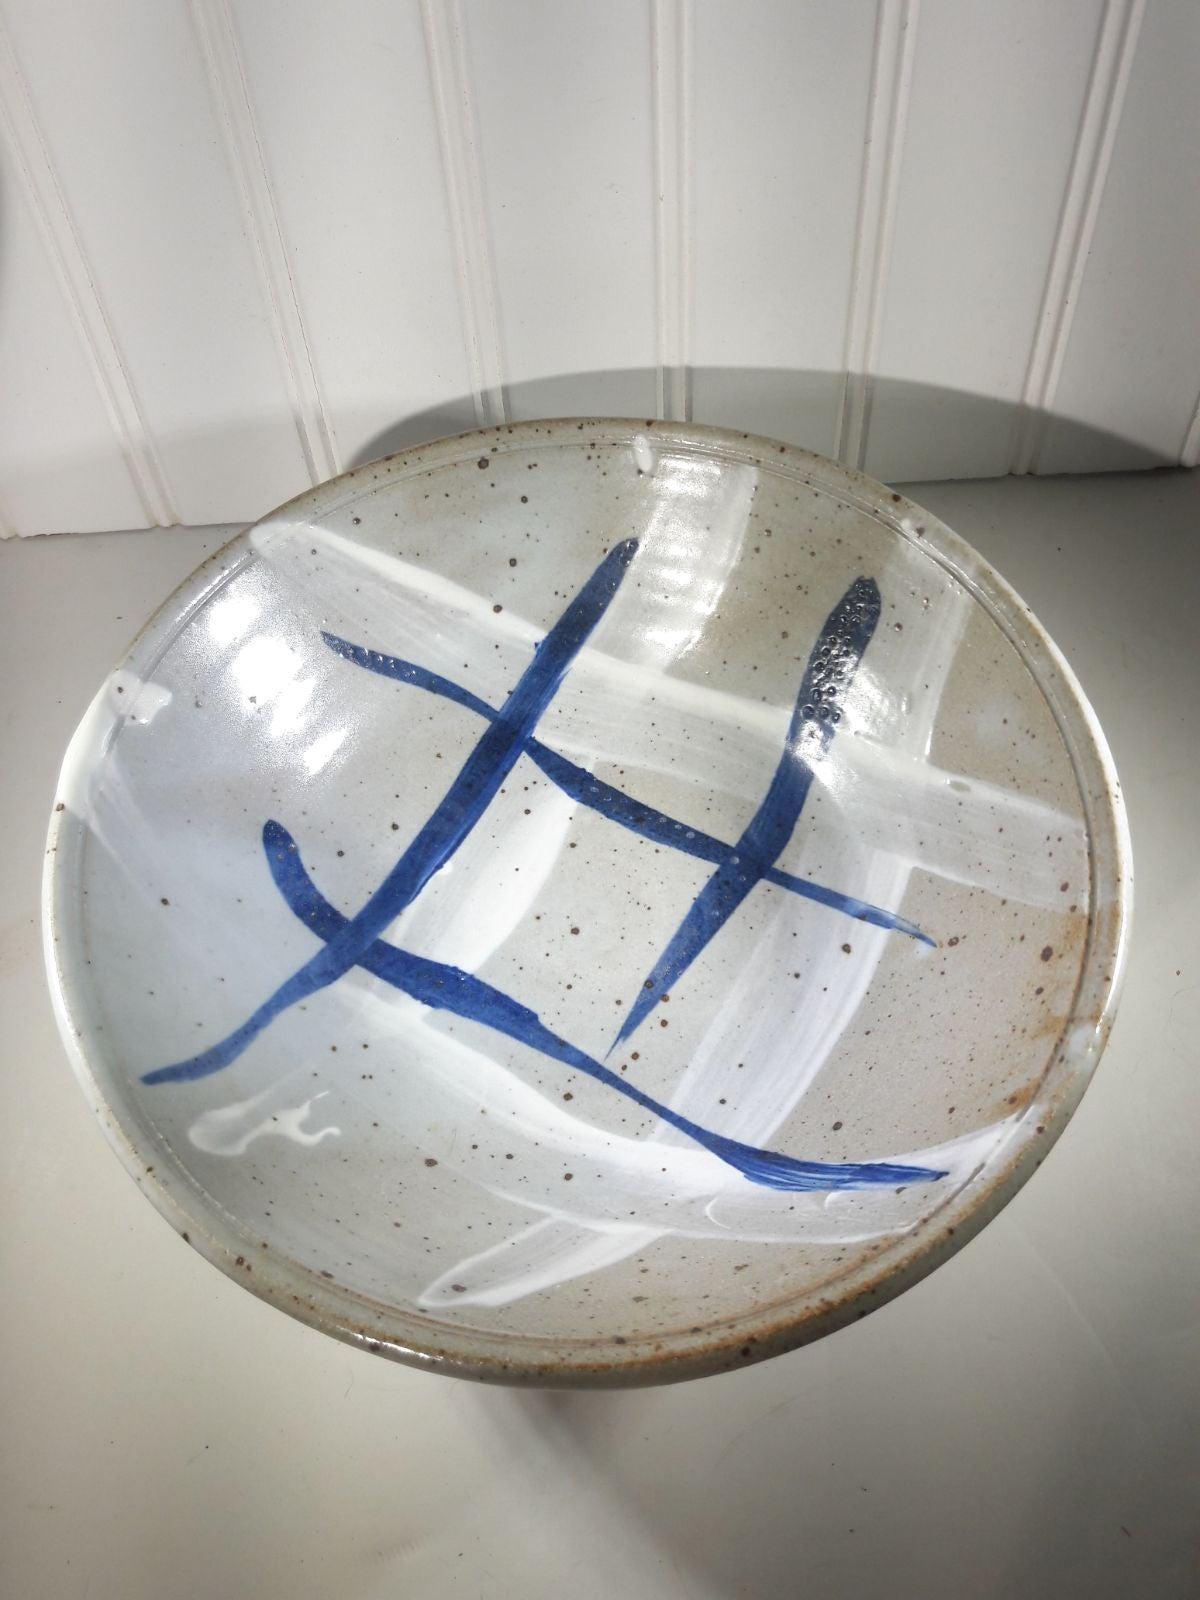 Handmade Studio Art Pottery Bowl by Marc